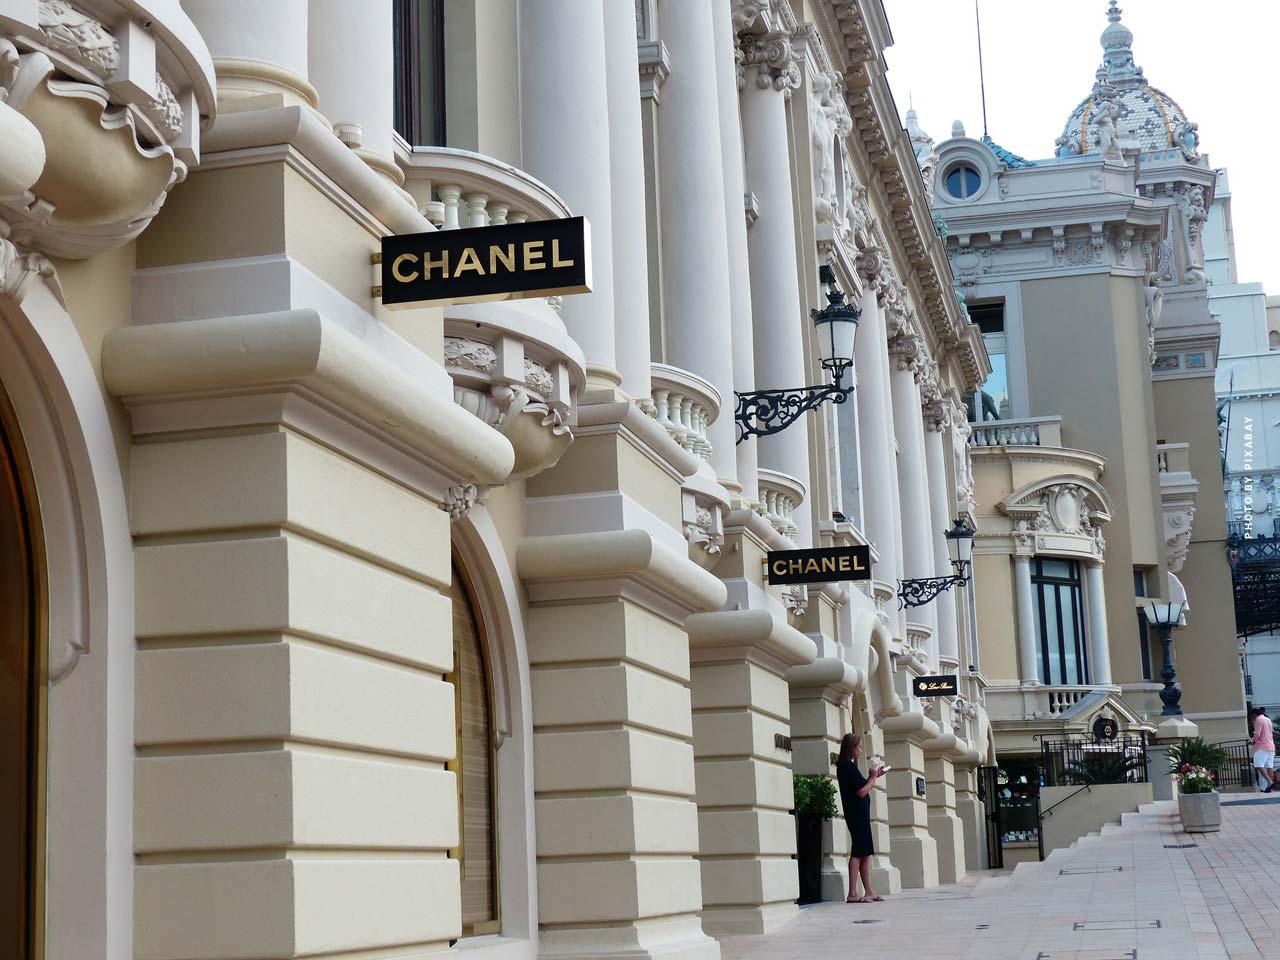 Chanel: N°5, borsa, catena, occhiali & altro - Fashion by Coco Chanel & Karl Lagerfeld